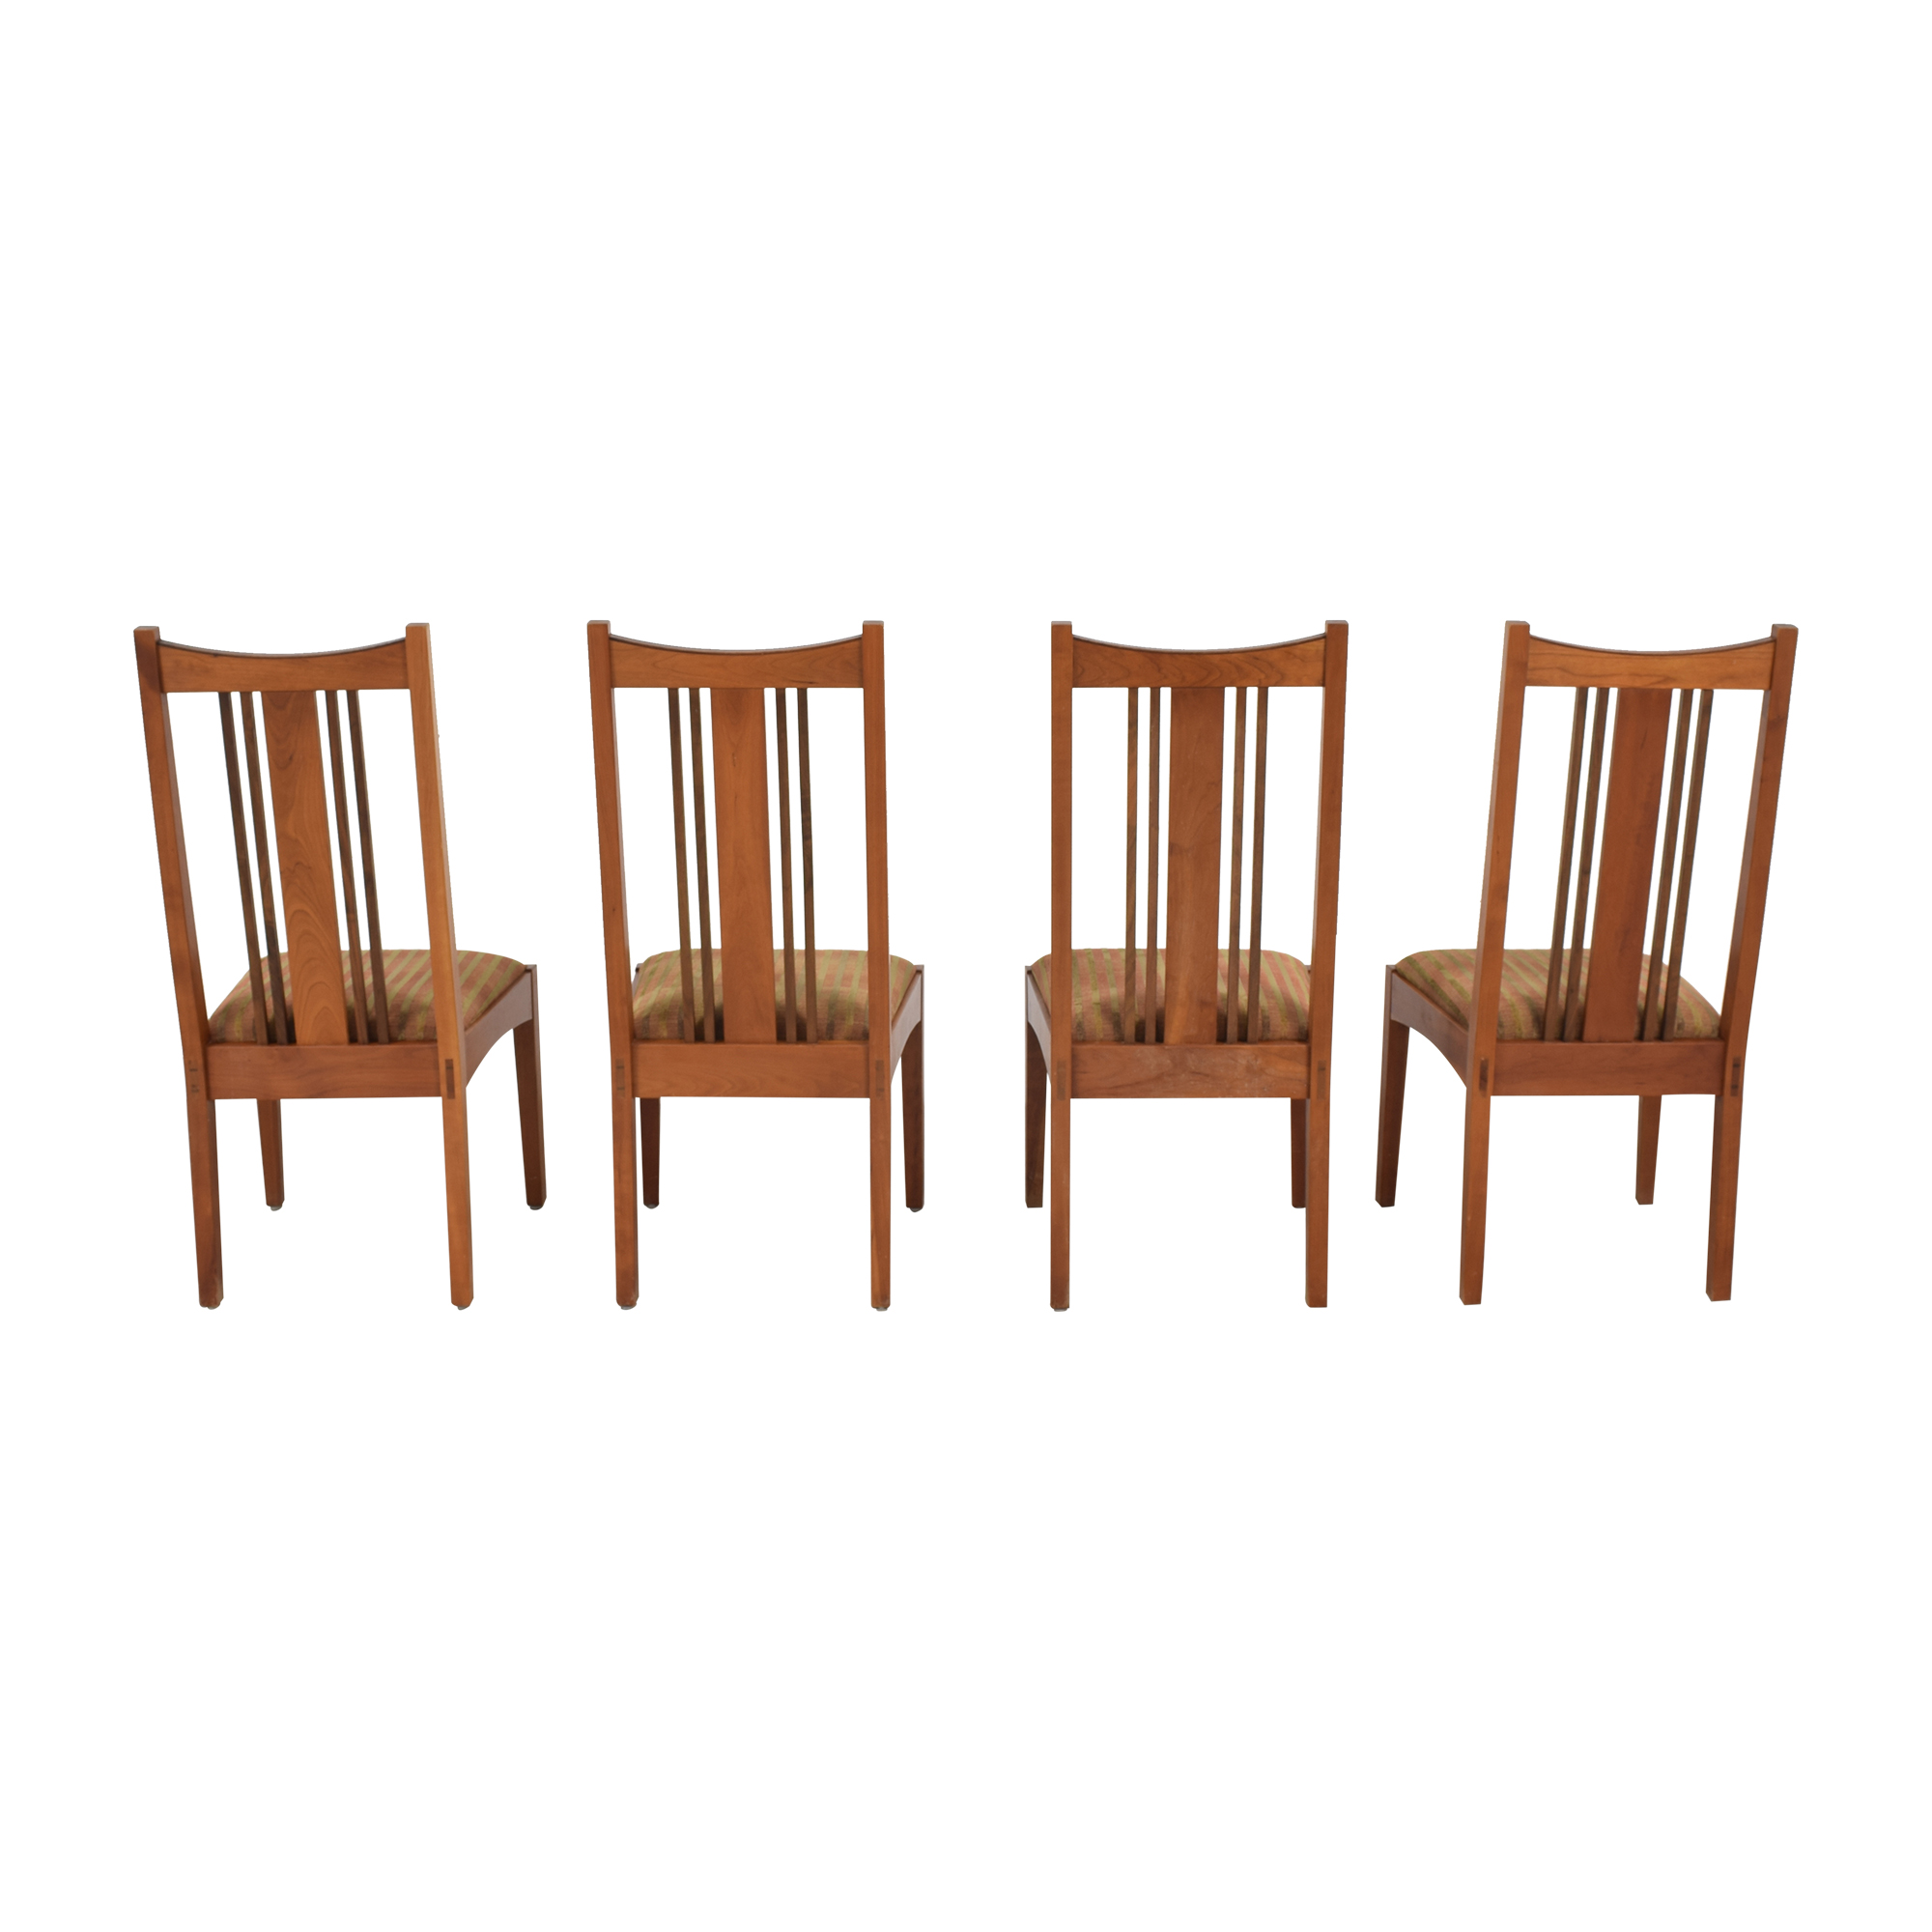 Stickley Furniture Stickley Furniture Metropolitan Side Chair for sale